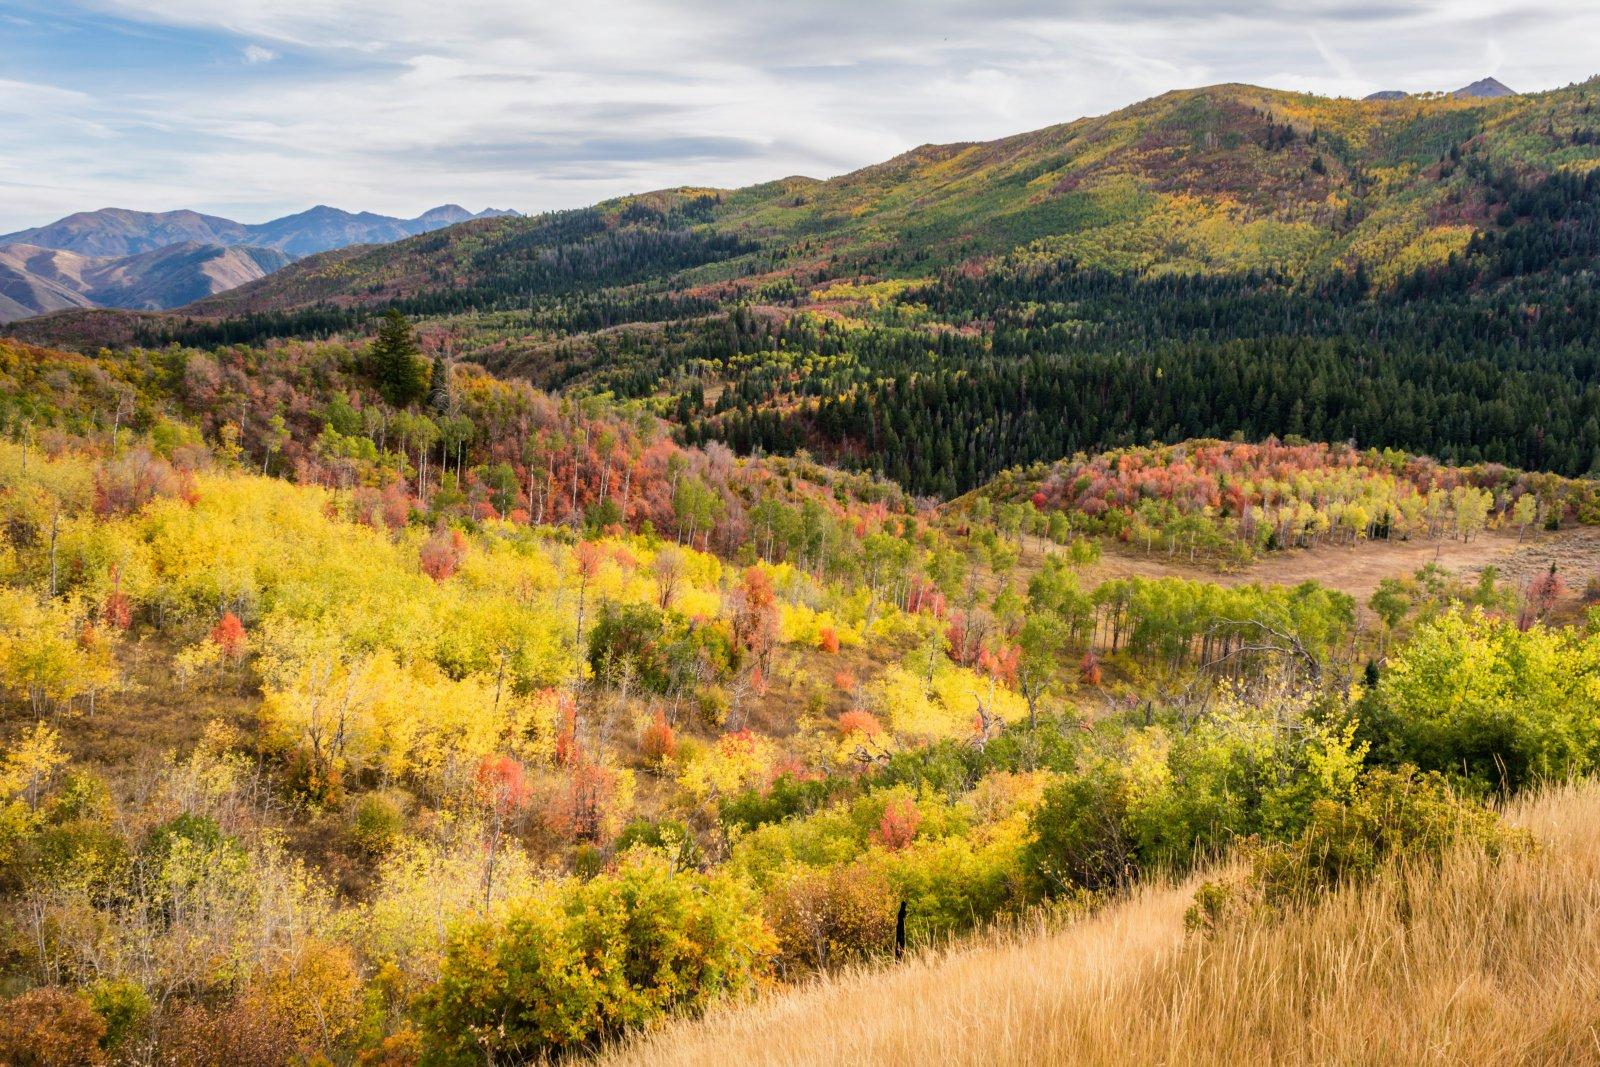 Ridge Autumn Leaves 9-20180222-proc.jpg